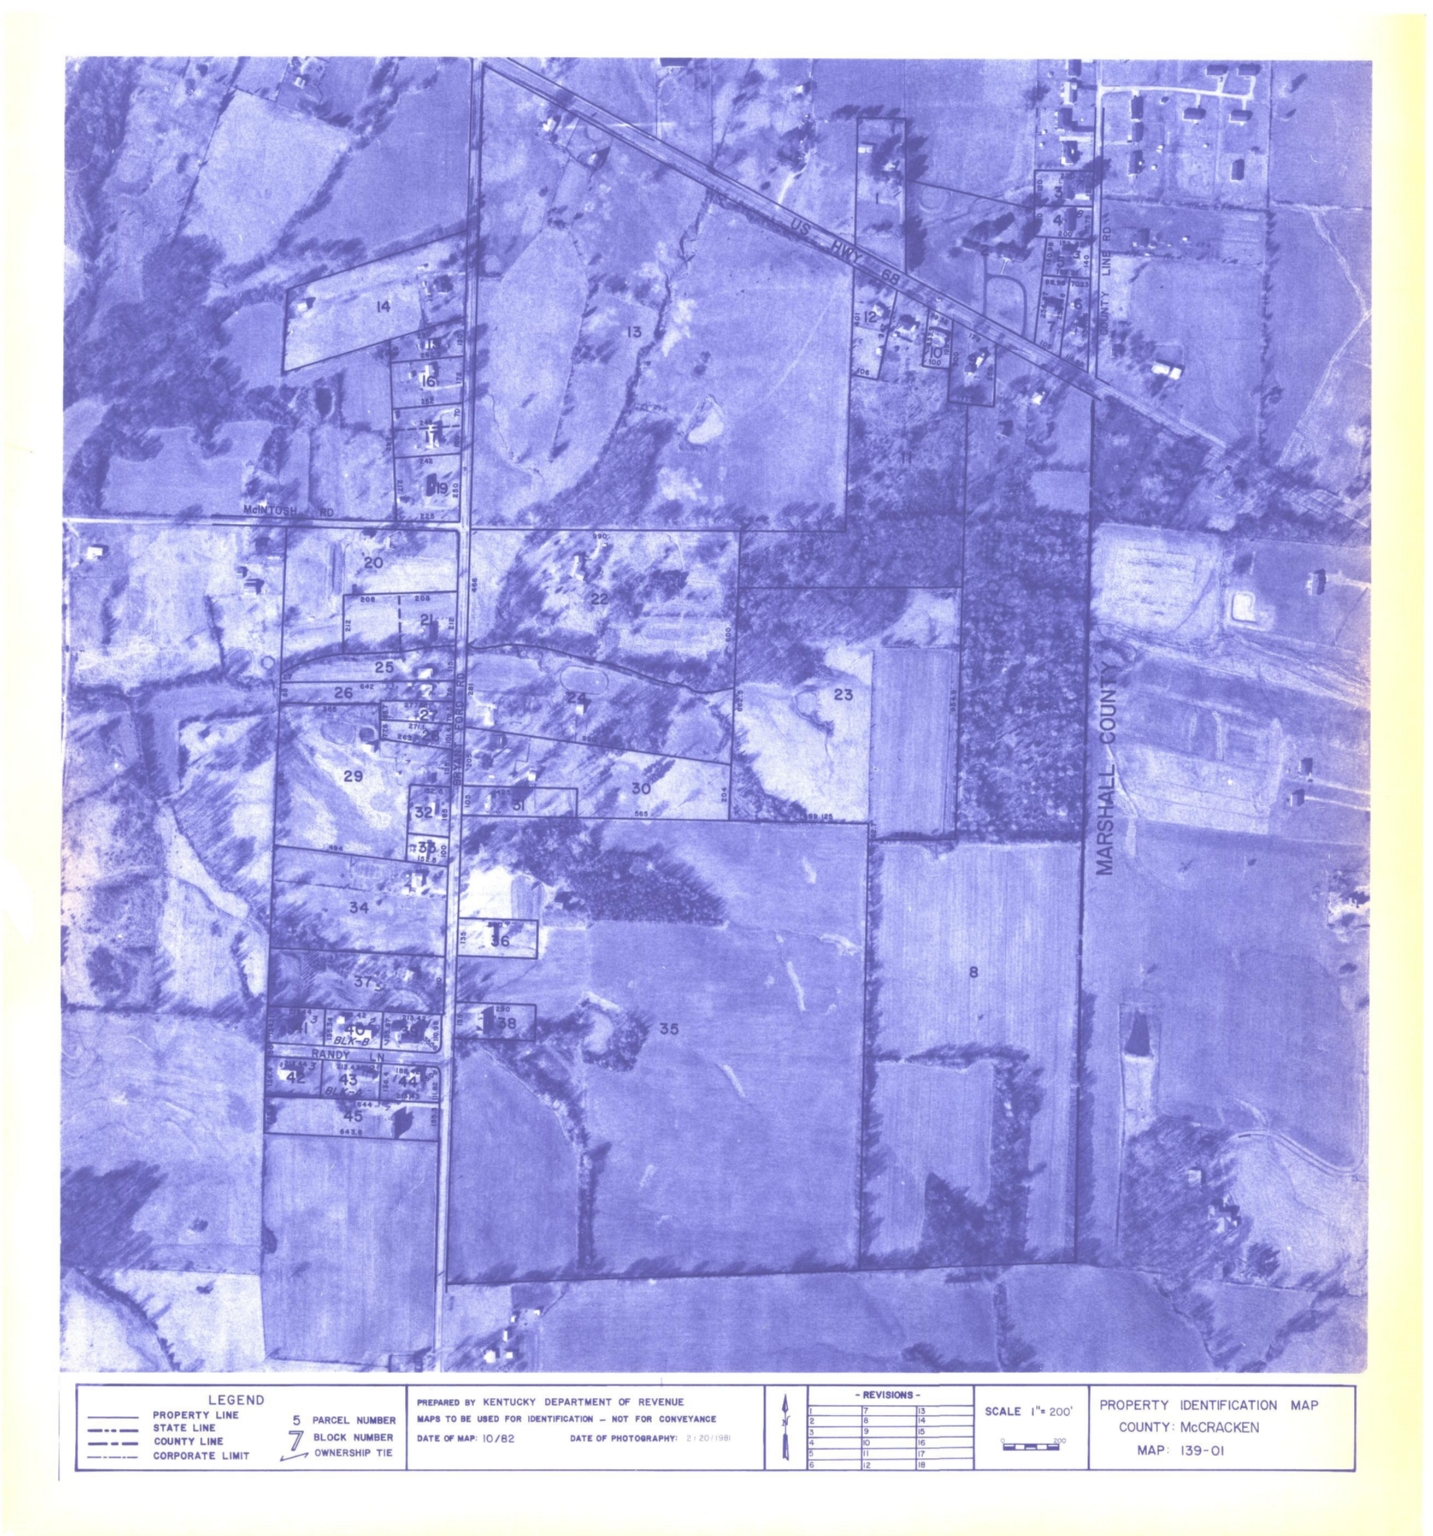 Property Identification Map McCracken County, Map 139-01